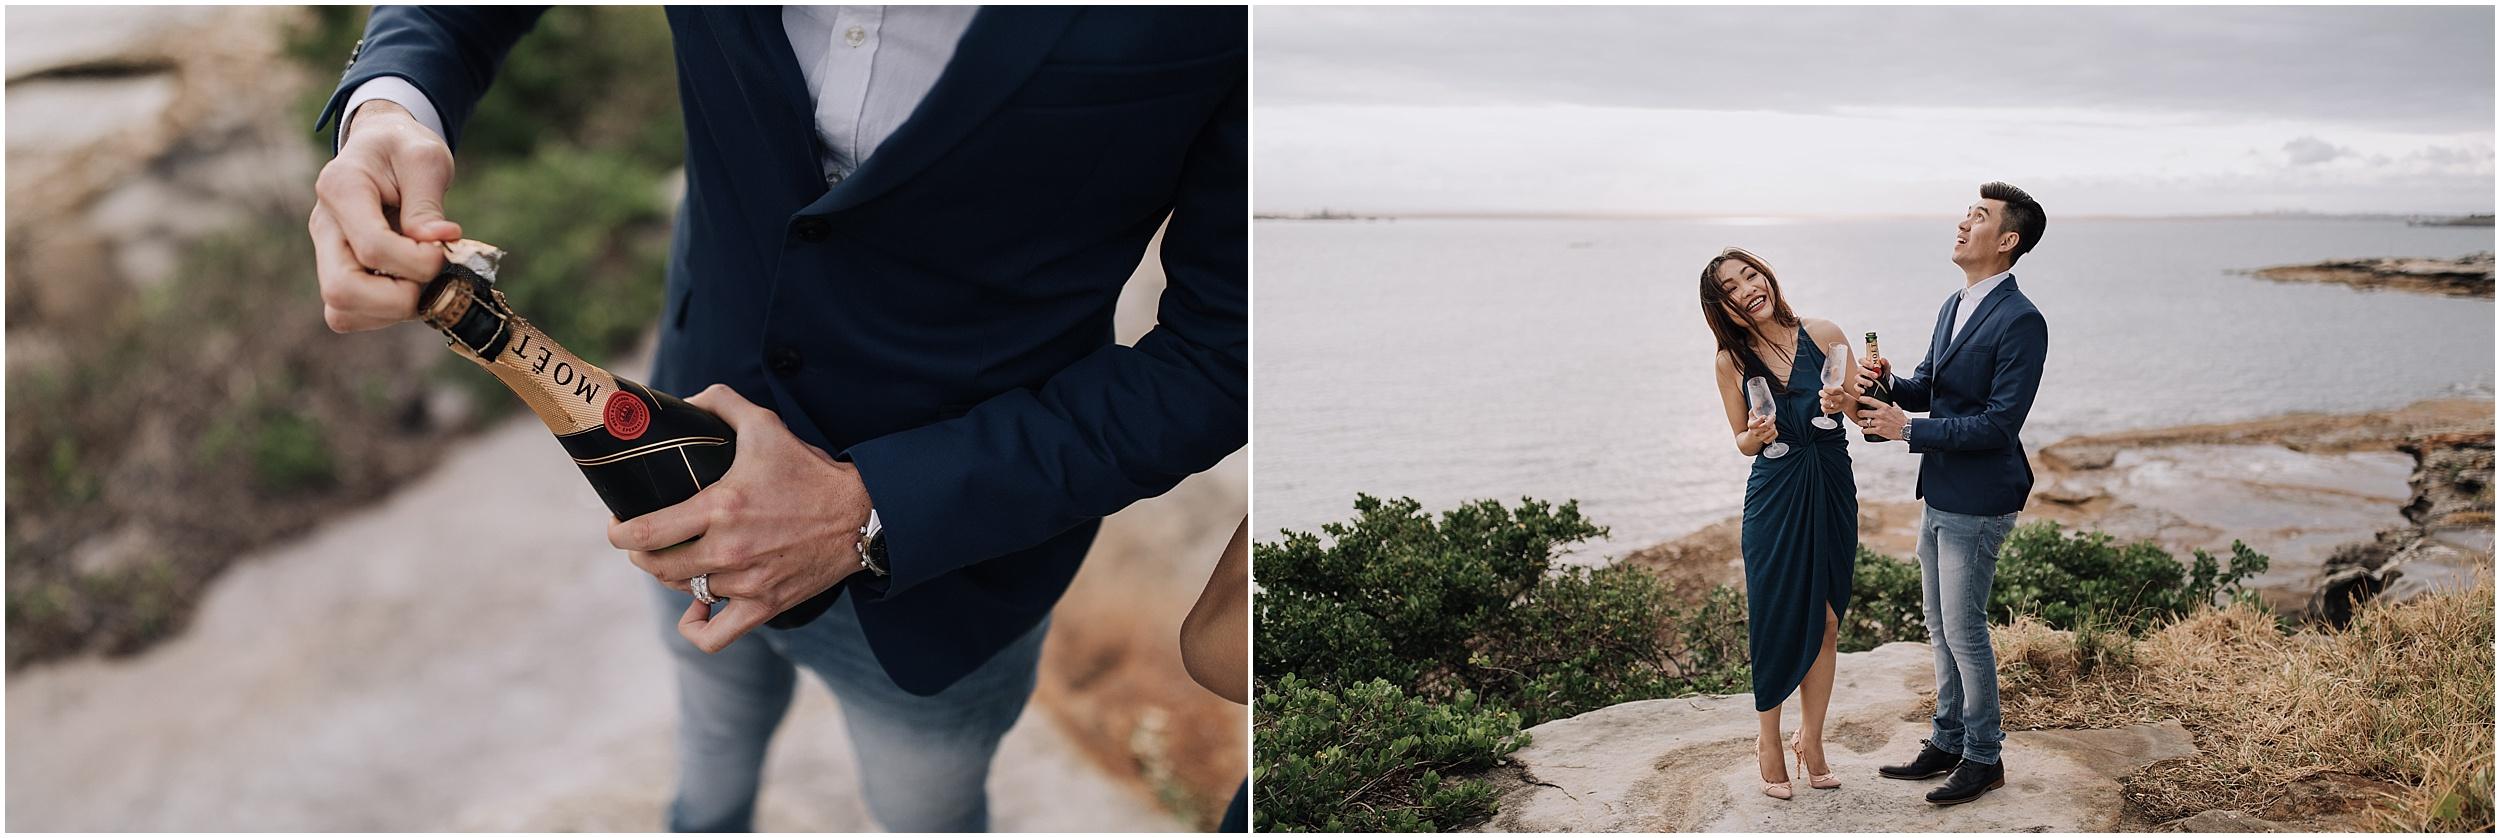 Sydney Pre-Wedding Engagement Photos La Perouse 17